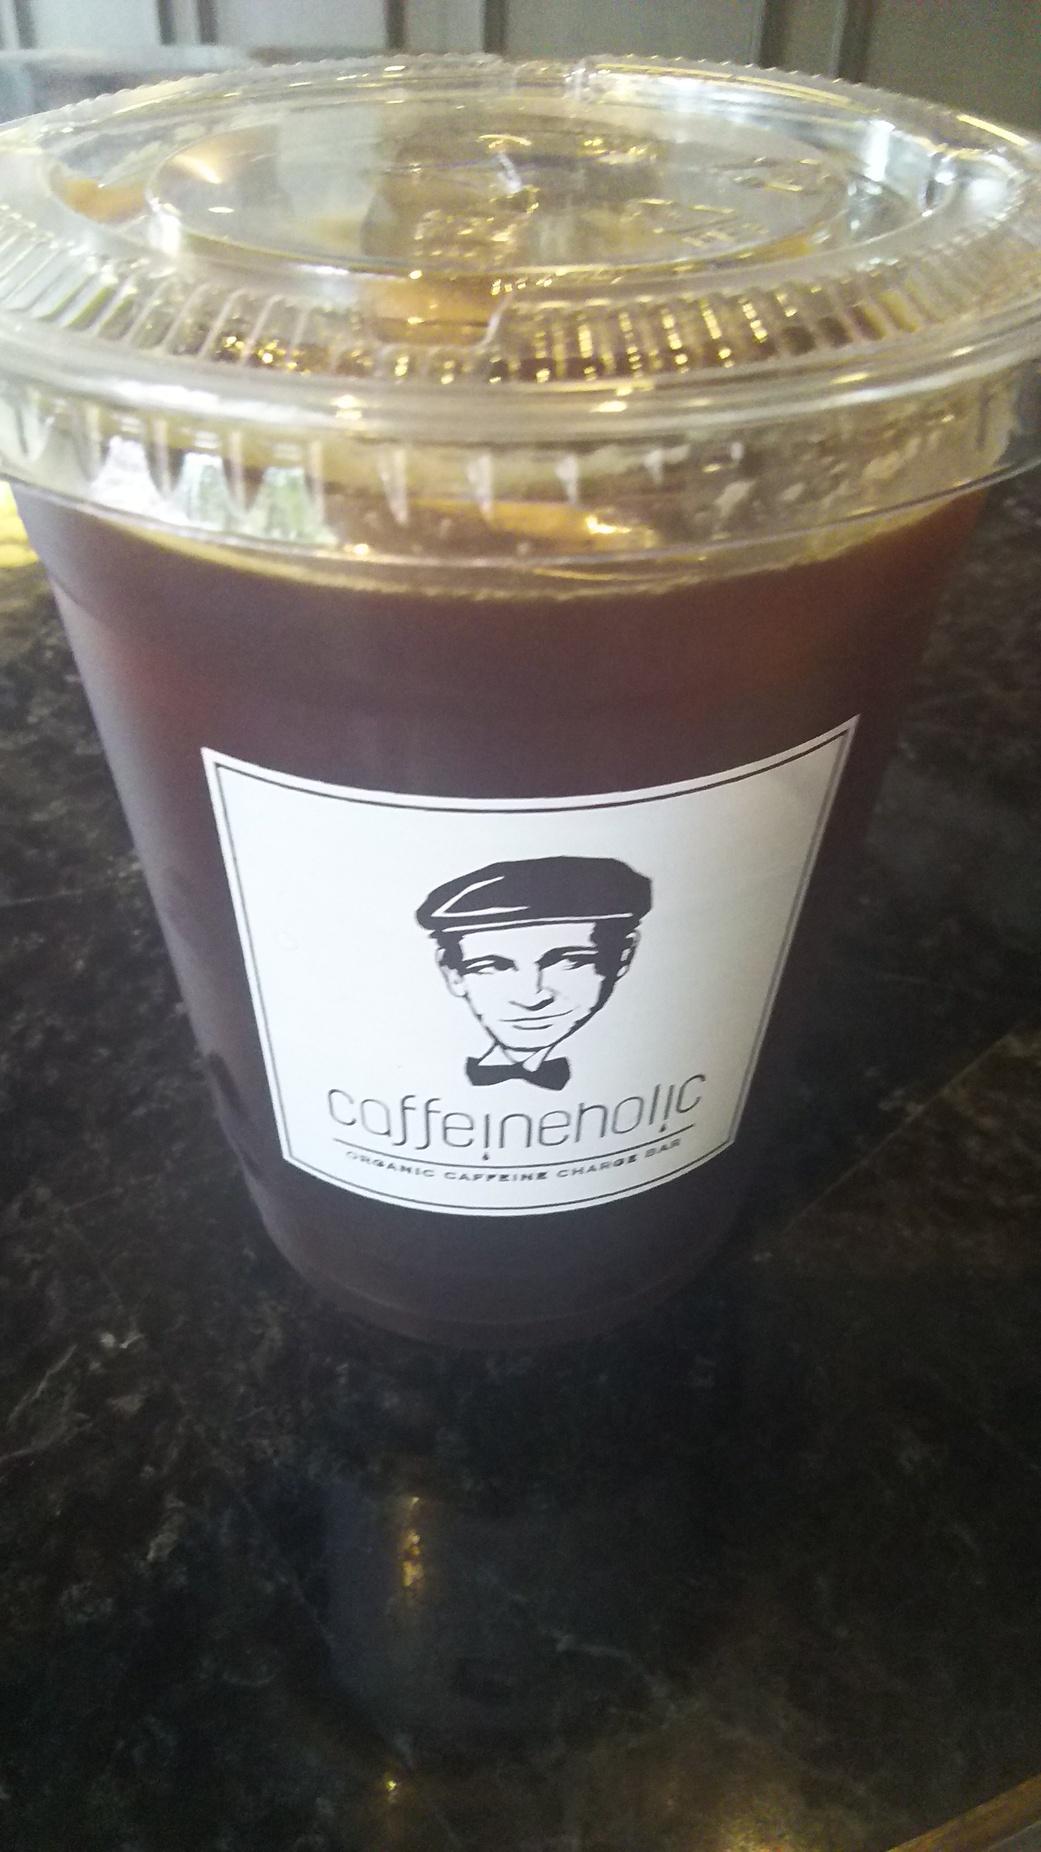 caffeineholic